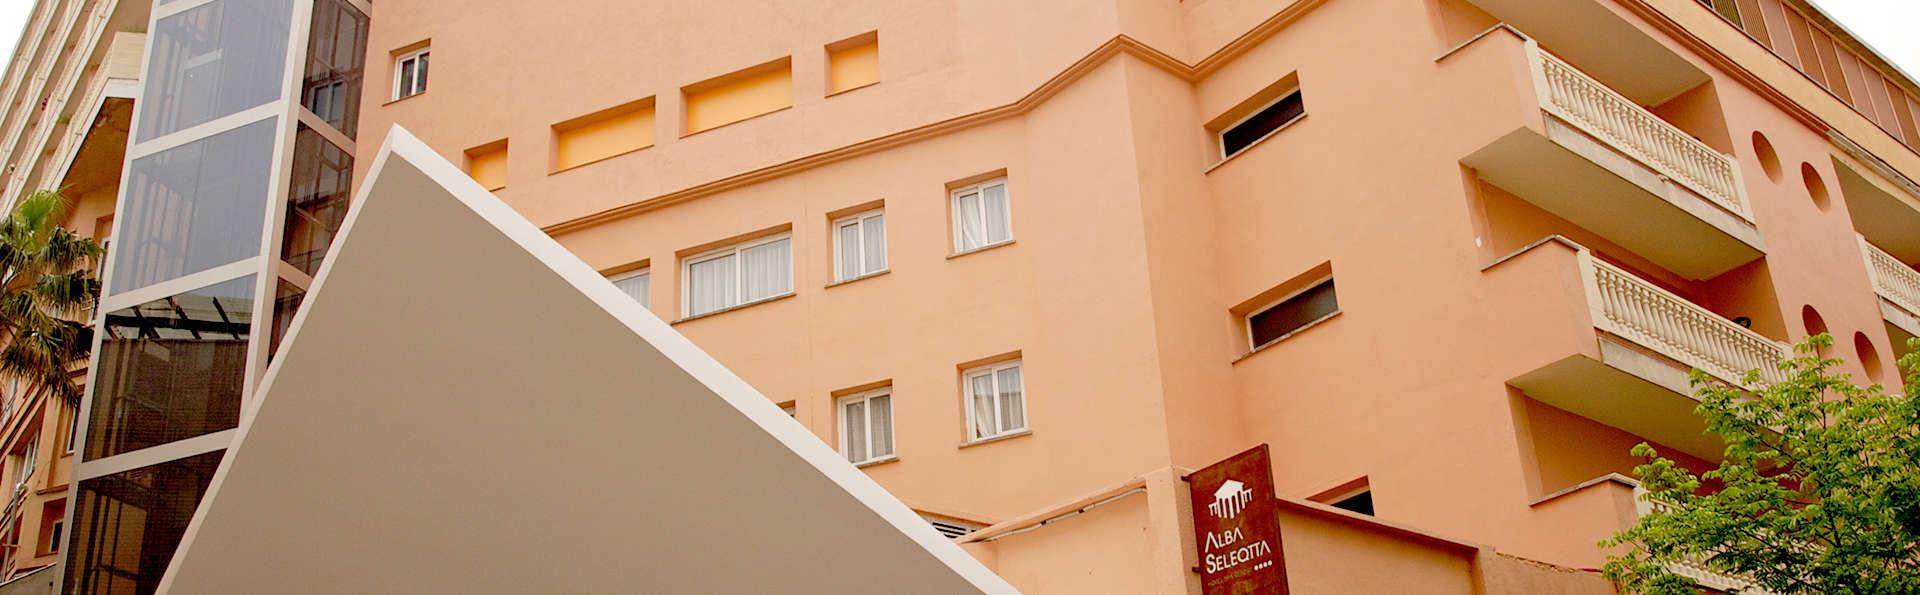 Hotel Alba Seleqtta - Edit_Front.jpg